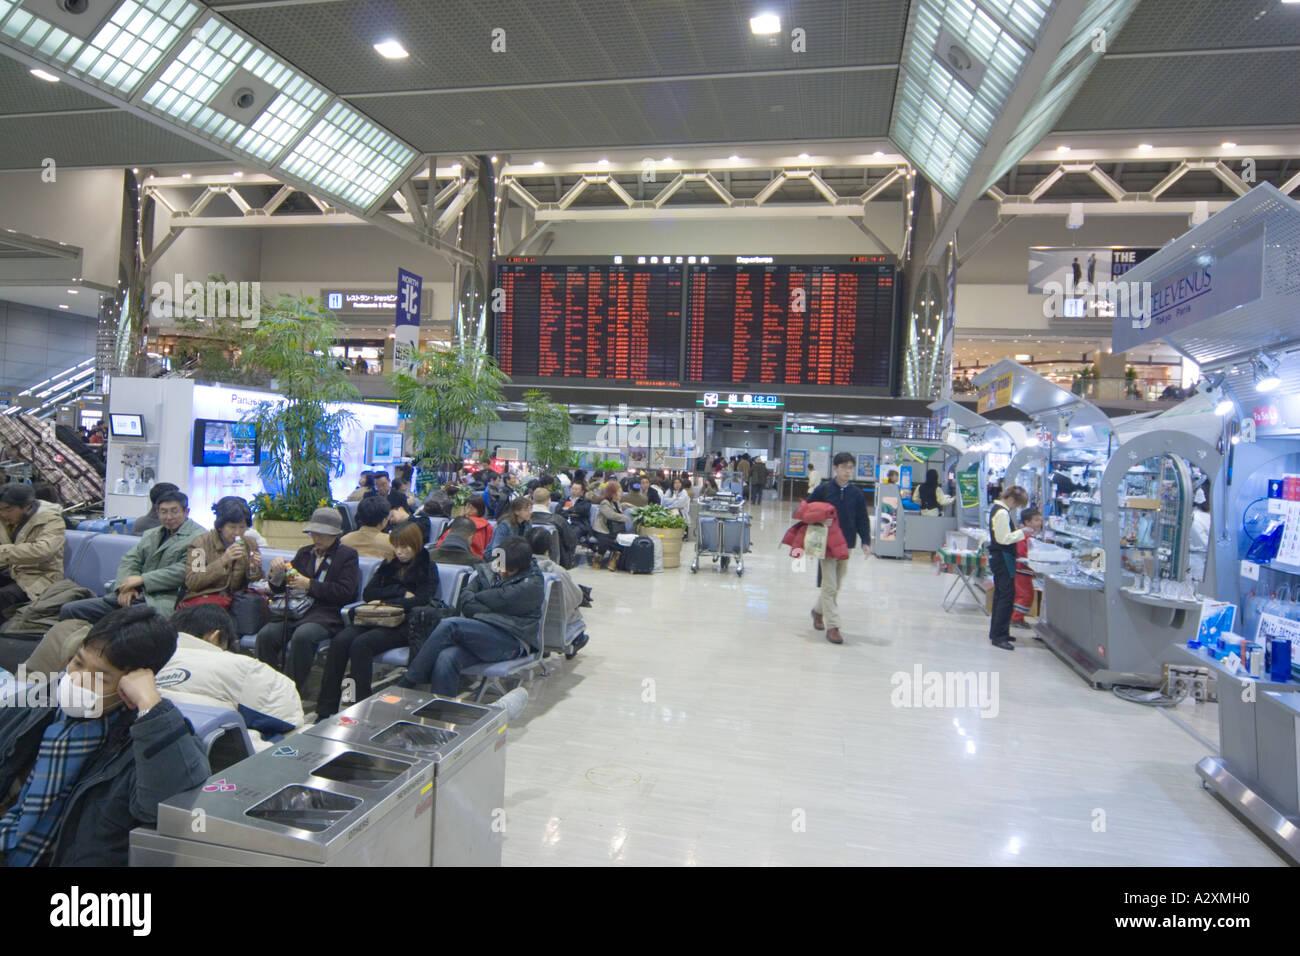 Tokyo Japan Narita Airport Terminal 2 Interior Departures arrivals Stock Photo. Royalty Free Image: 6064399 - Alamy